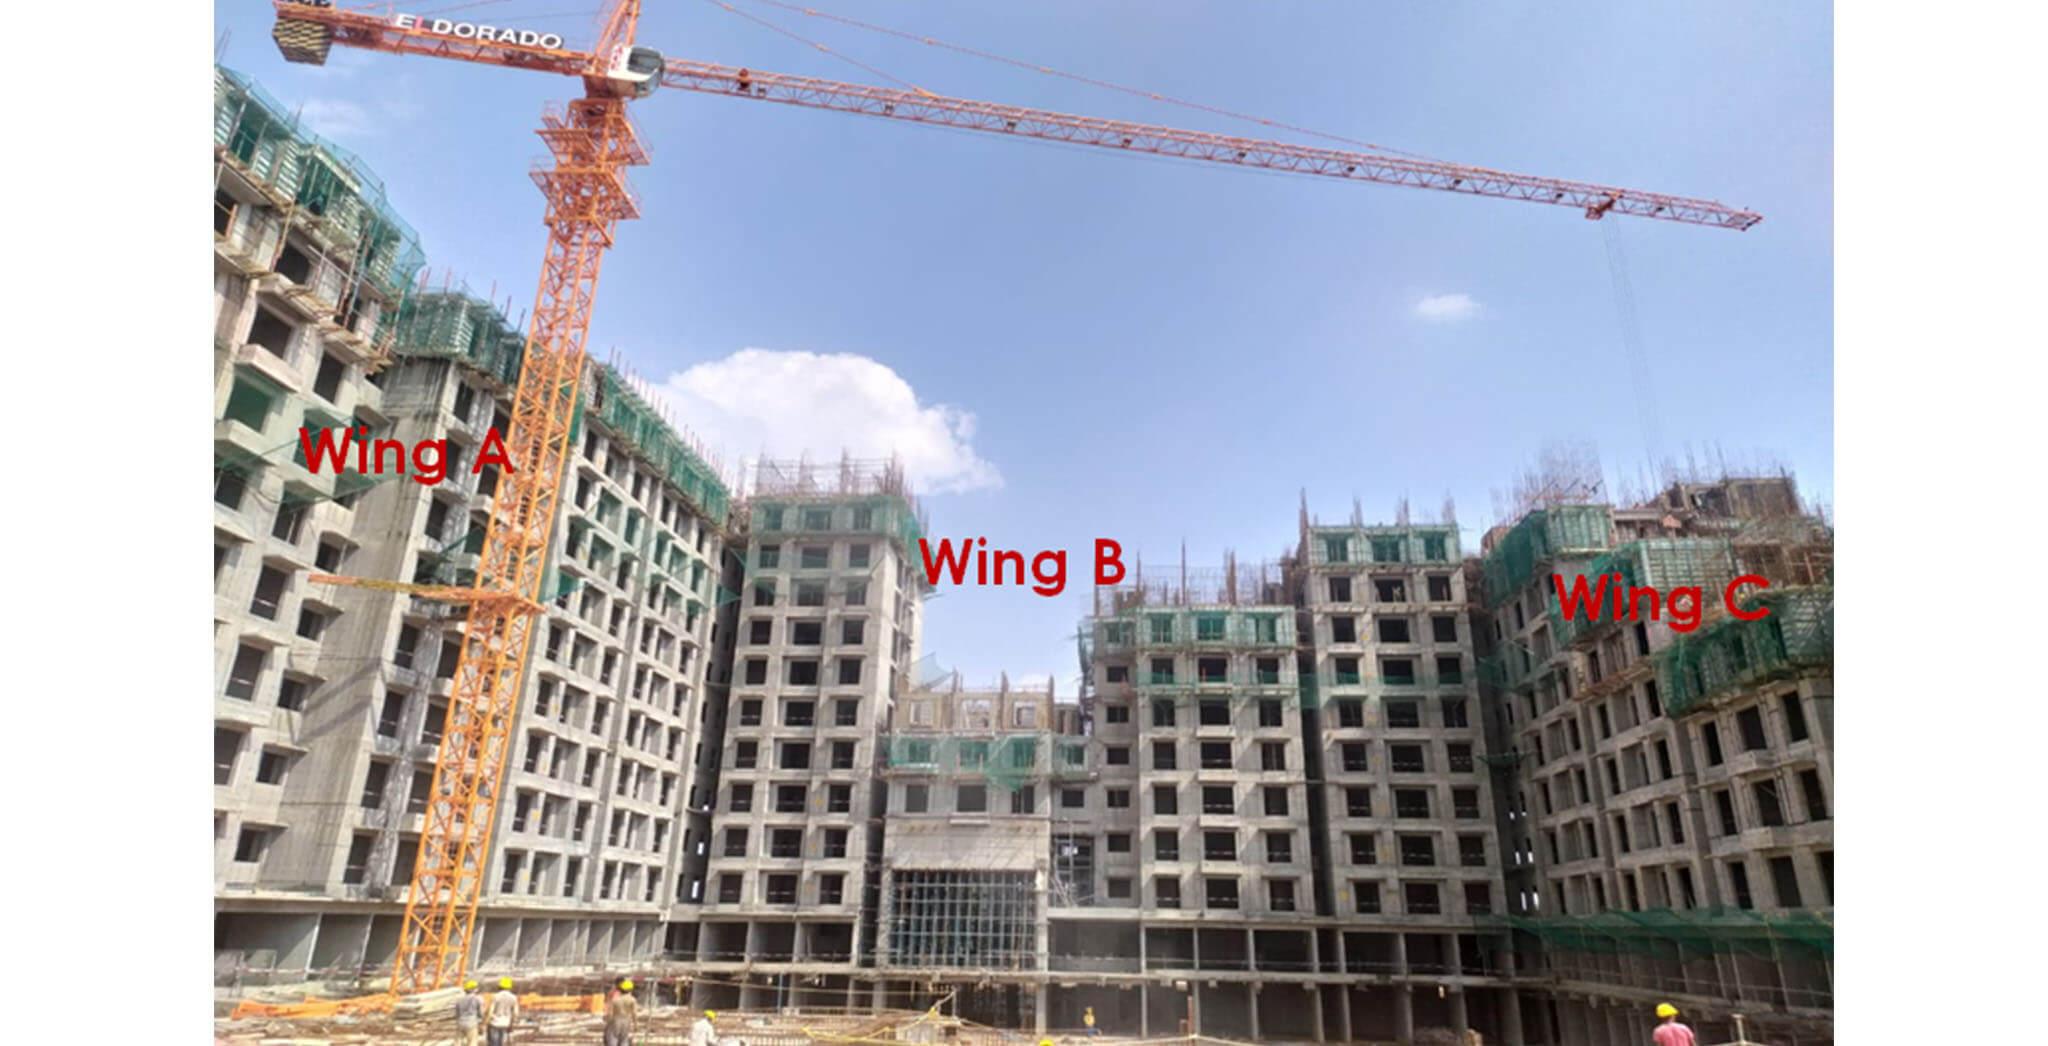 Jun 2021 - Helio Block: North elevation—overall progress